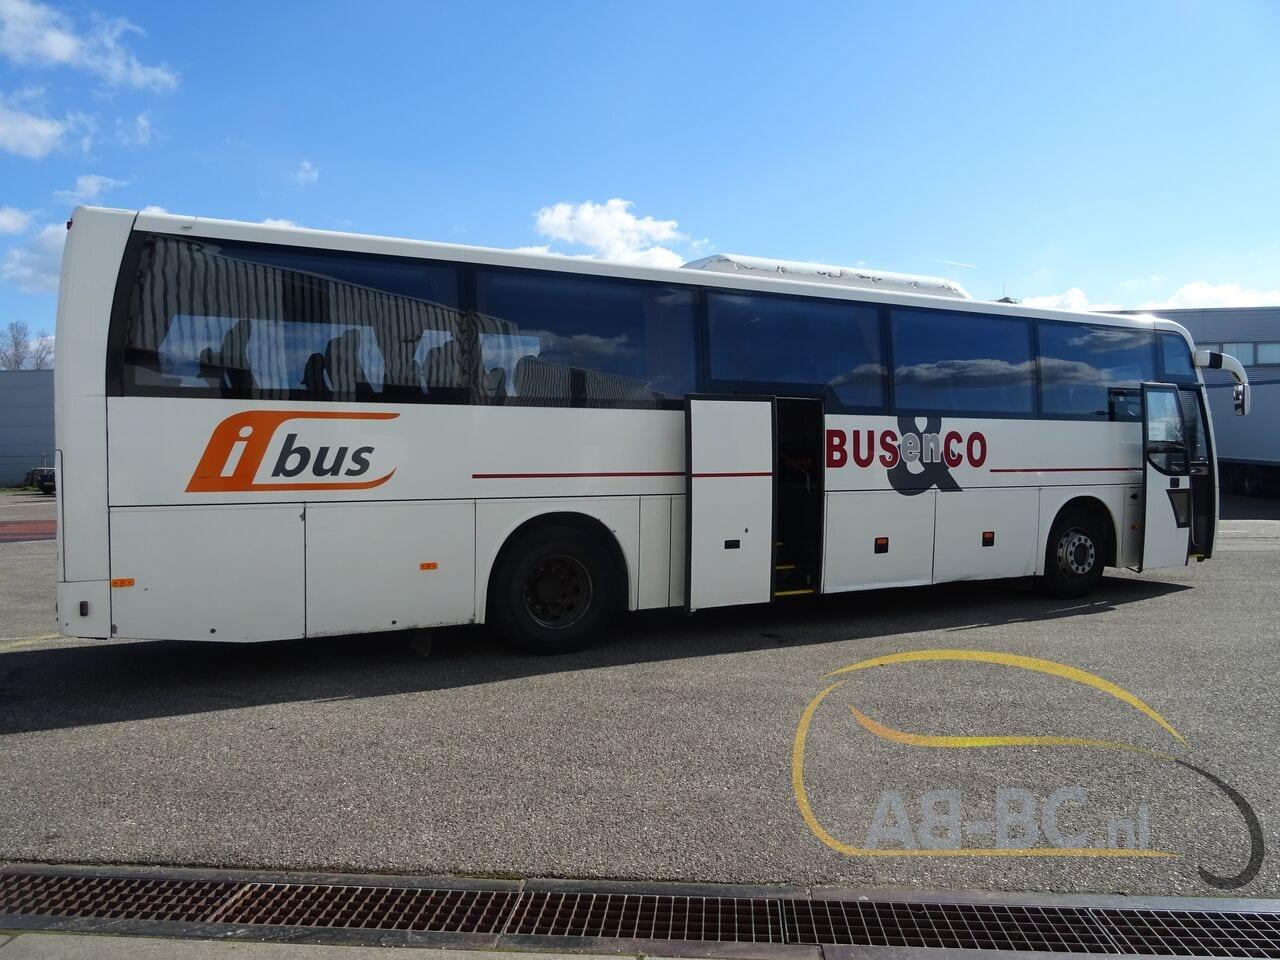 coach-busTEMSA-Safari-RD-53-Seats-DAF-Motor-12-mtr---1616166578065561904_big_0b6c0ab0a585cadf1c7656637c578e25--21031917053743807500